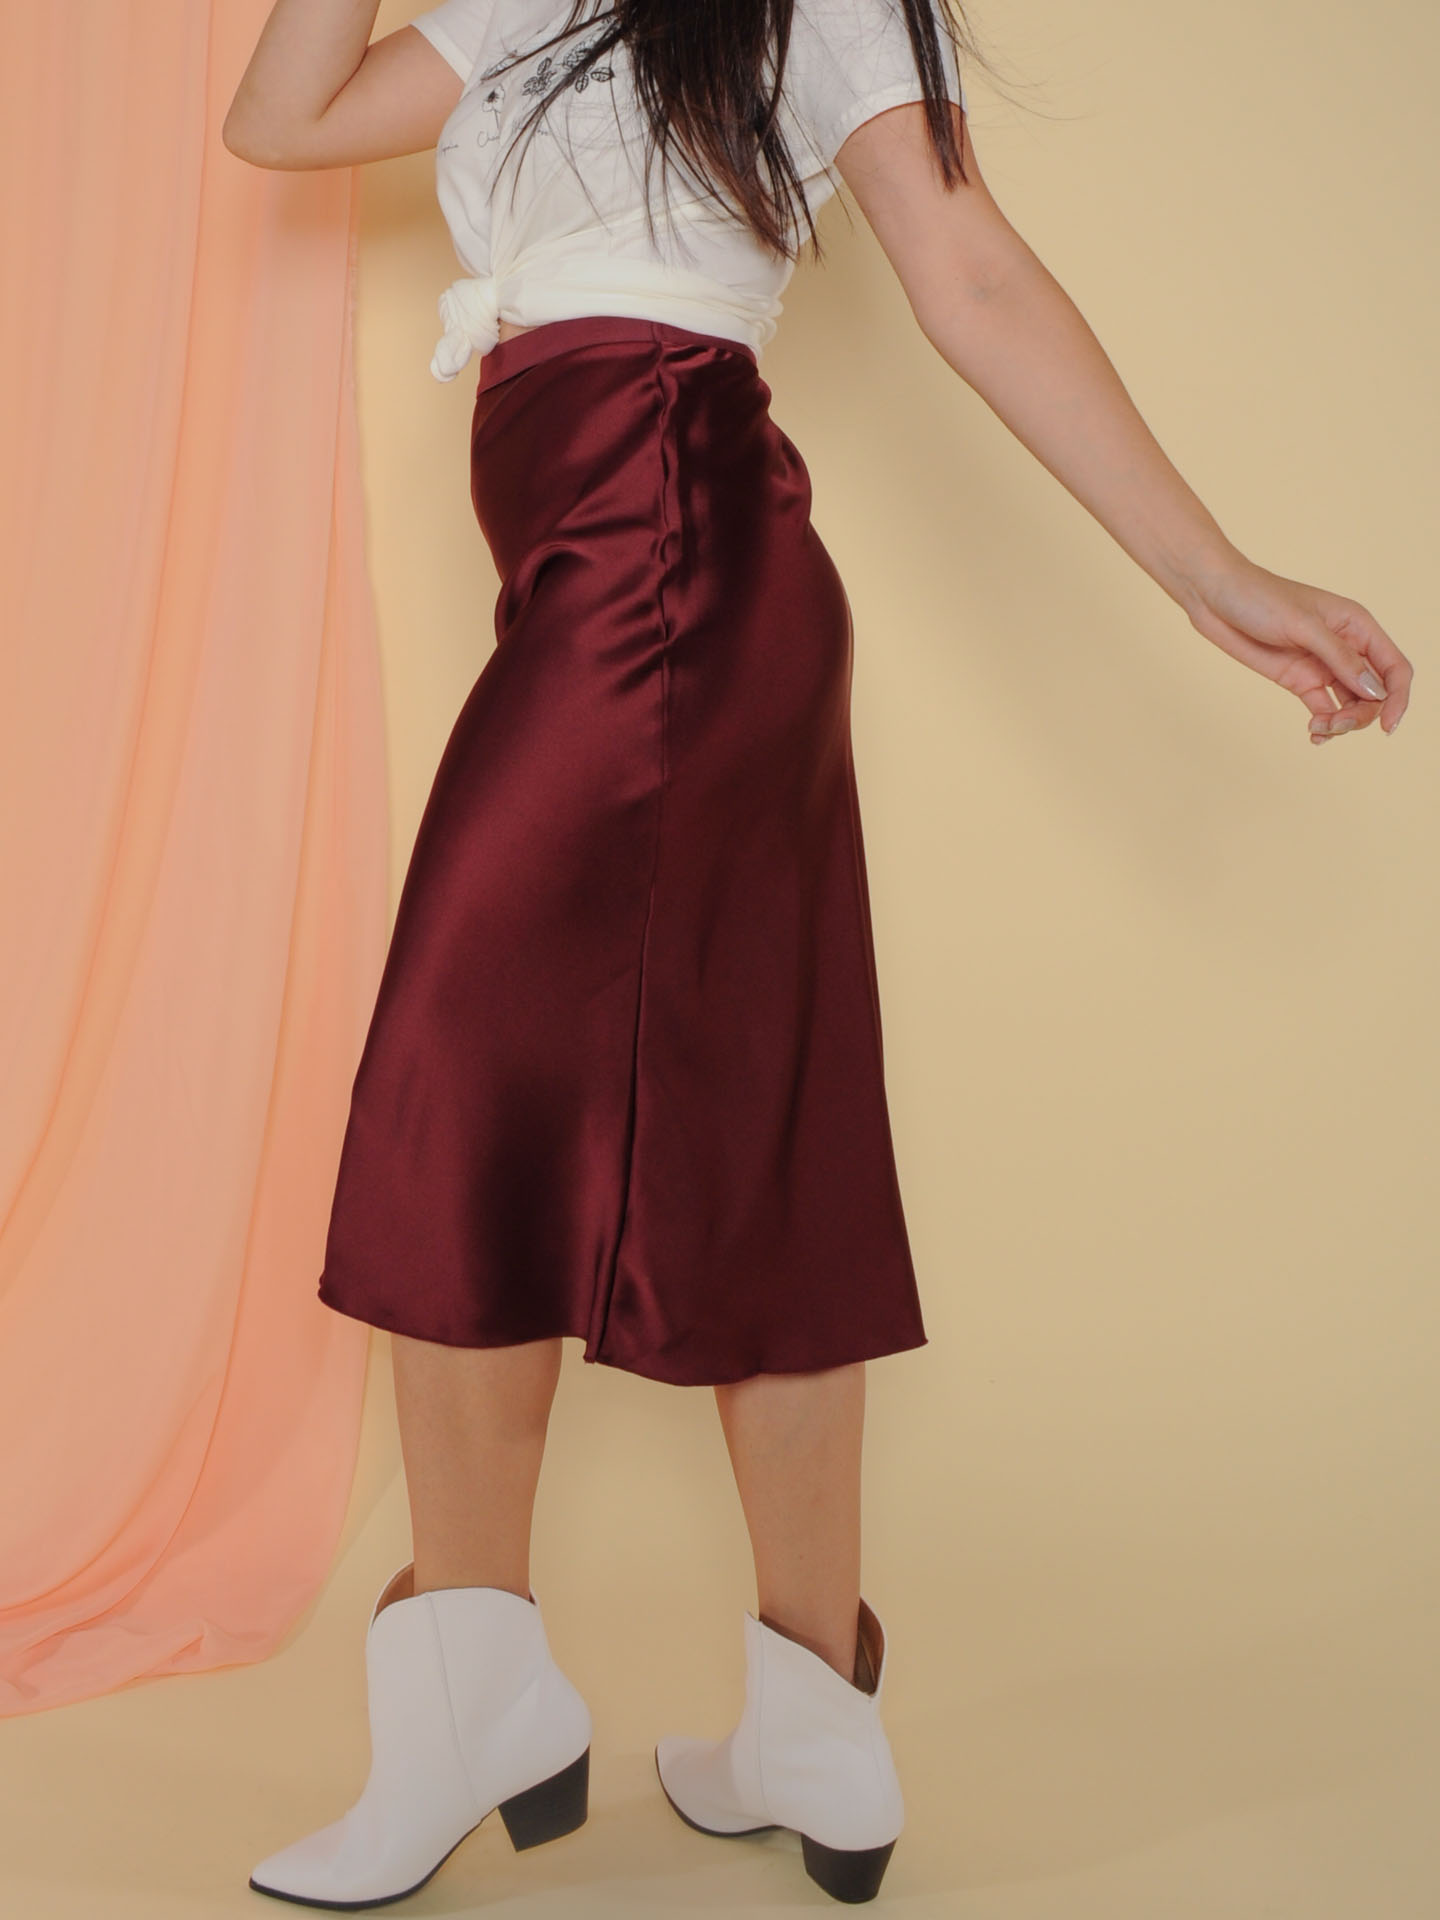 Superior Skirt Sleek and Satin Midi Burgandy Side